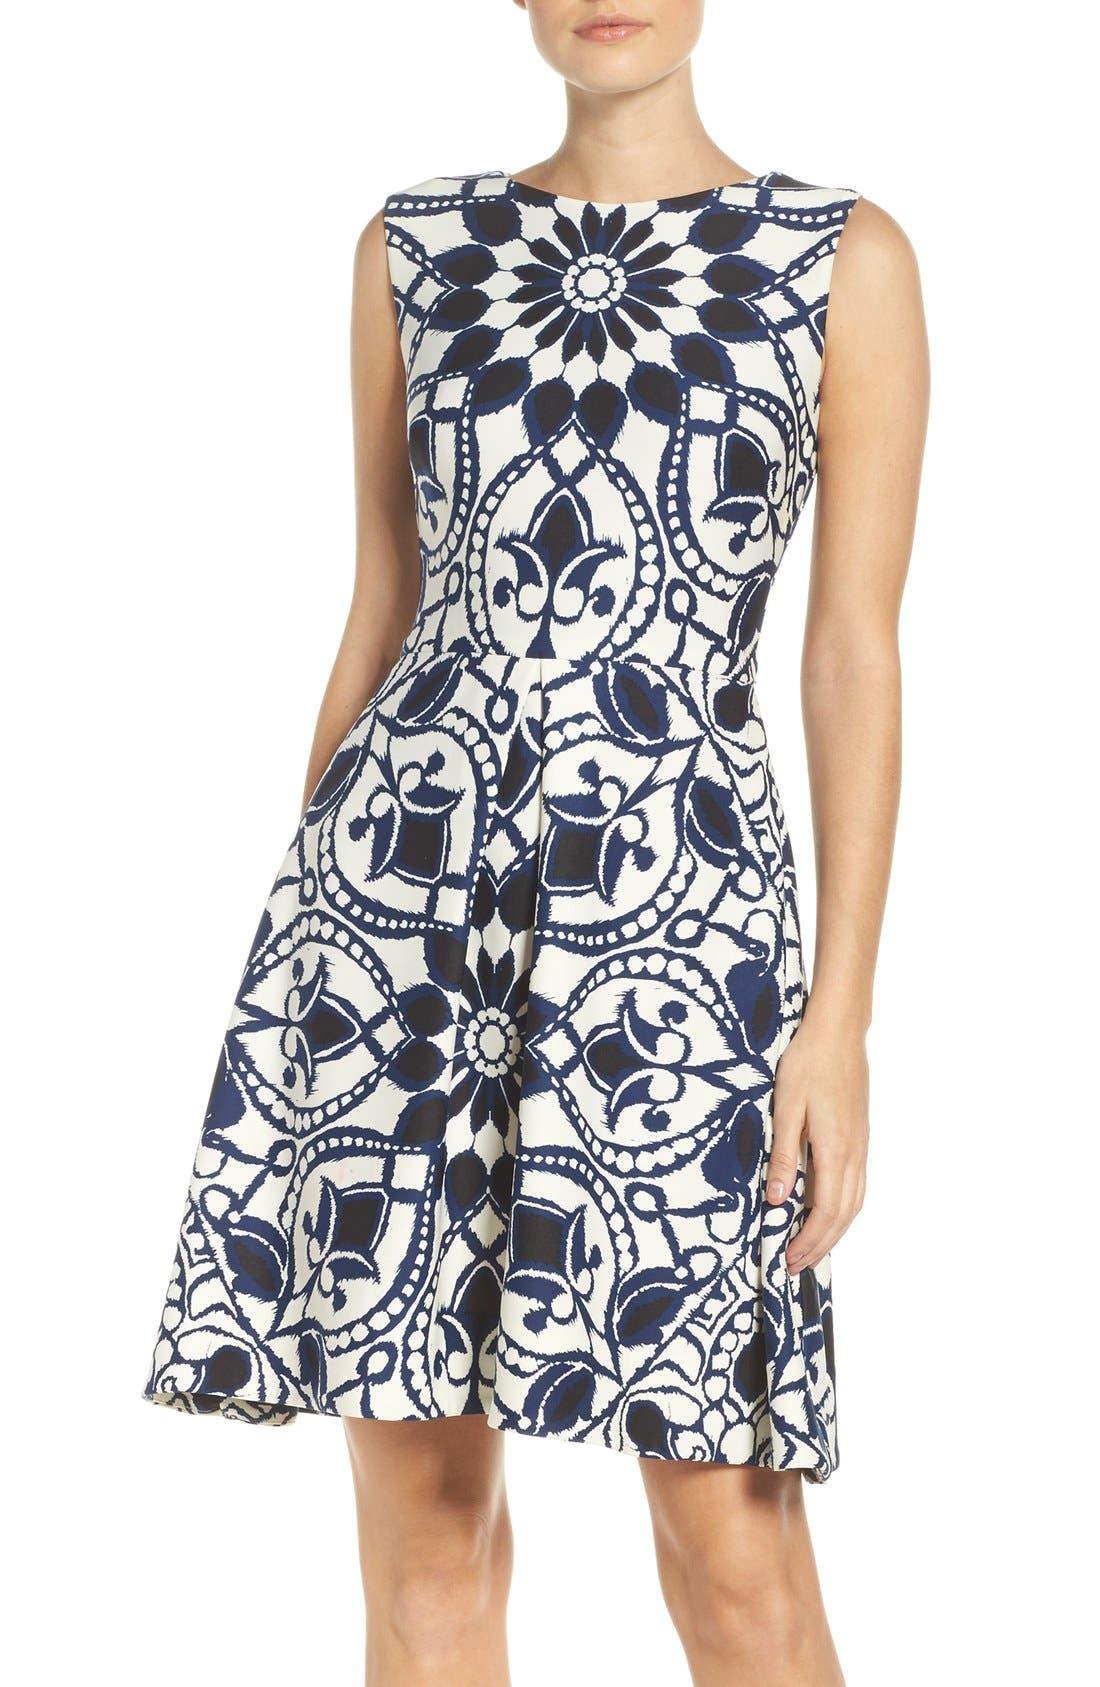 Alternate Image 1 Selected - Taylor Dresses Mirror Print Fit & Flare Dress